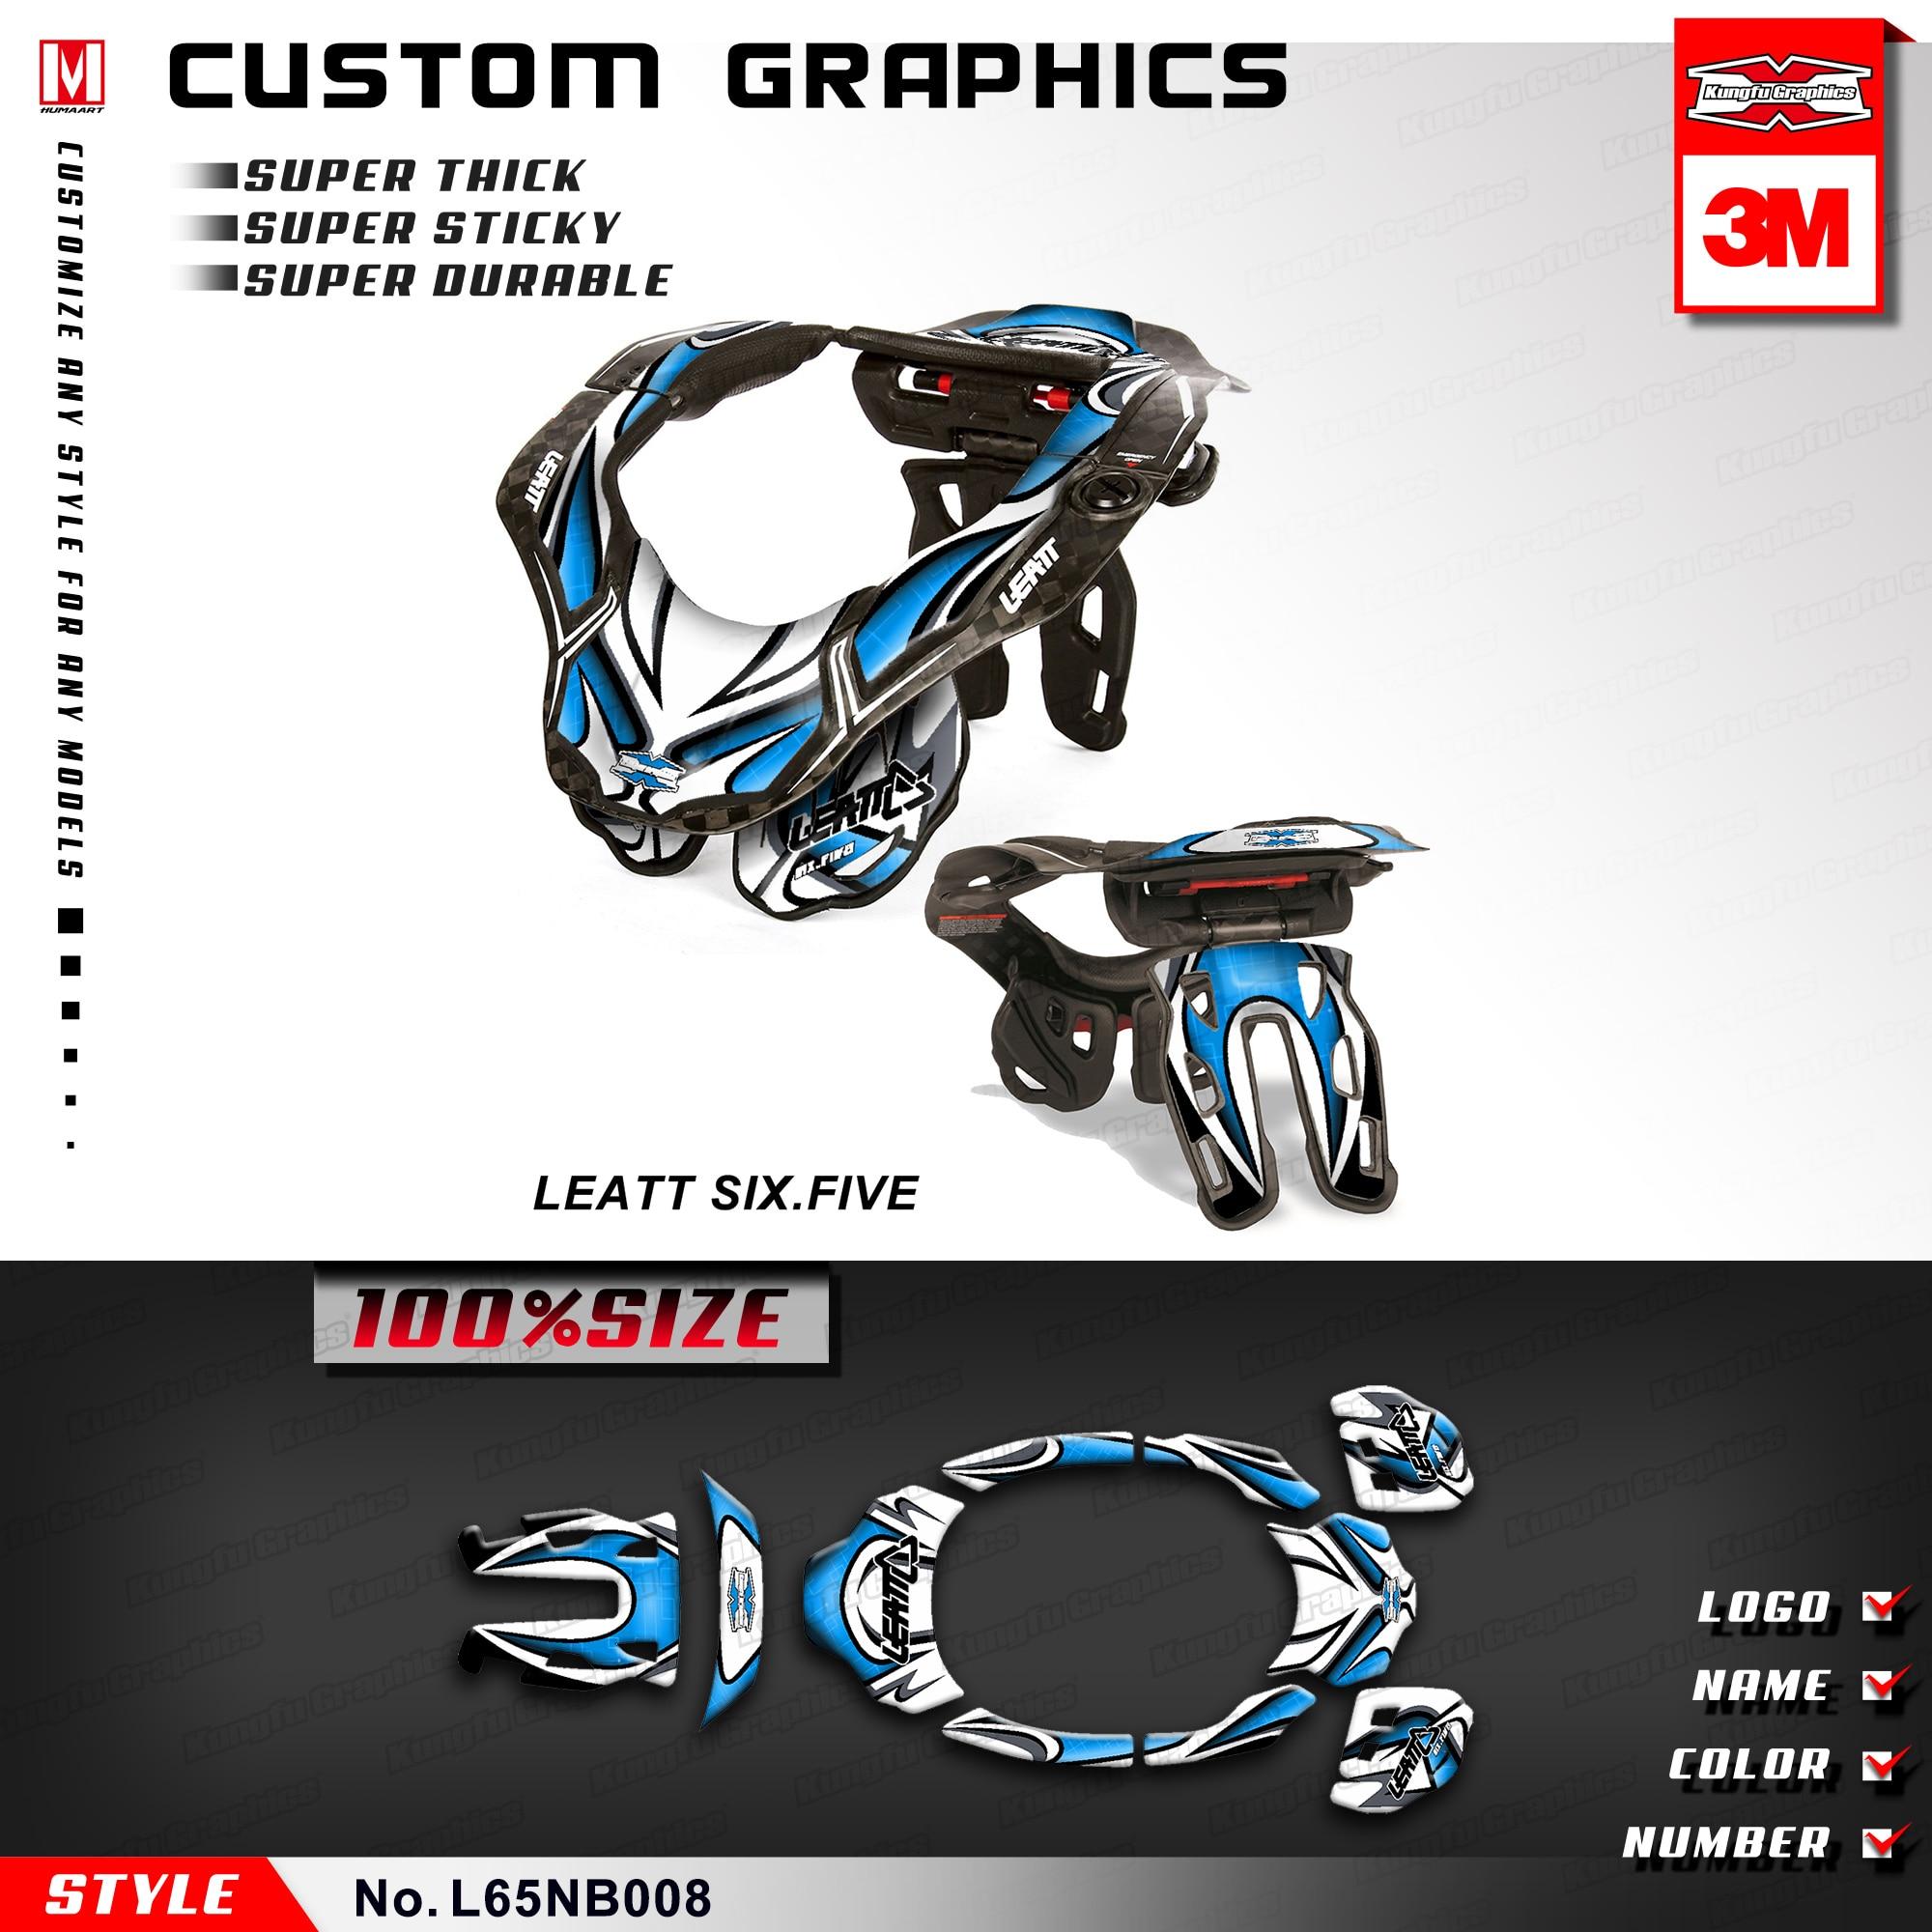 Adhesivos autoadhesivos para gráficos KUNGFU MX, calcomanías de Motocross para Leatt GPX 6,5, seis cinco cuellos, Azul, Blanco (estilo n° L65NB008)